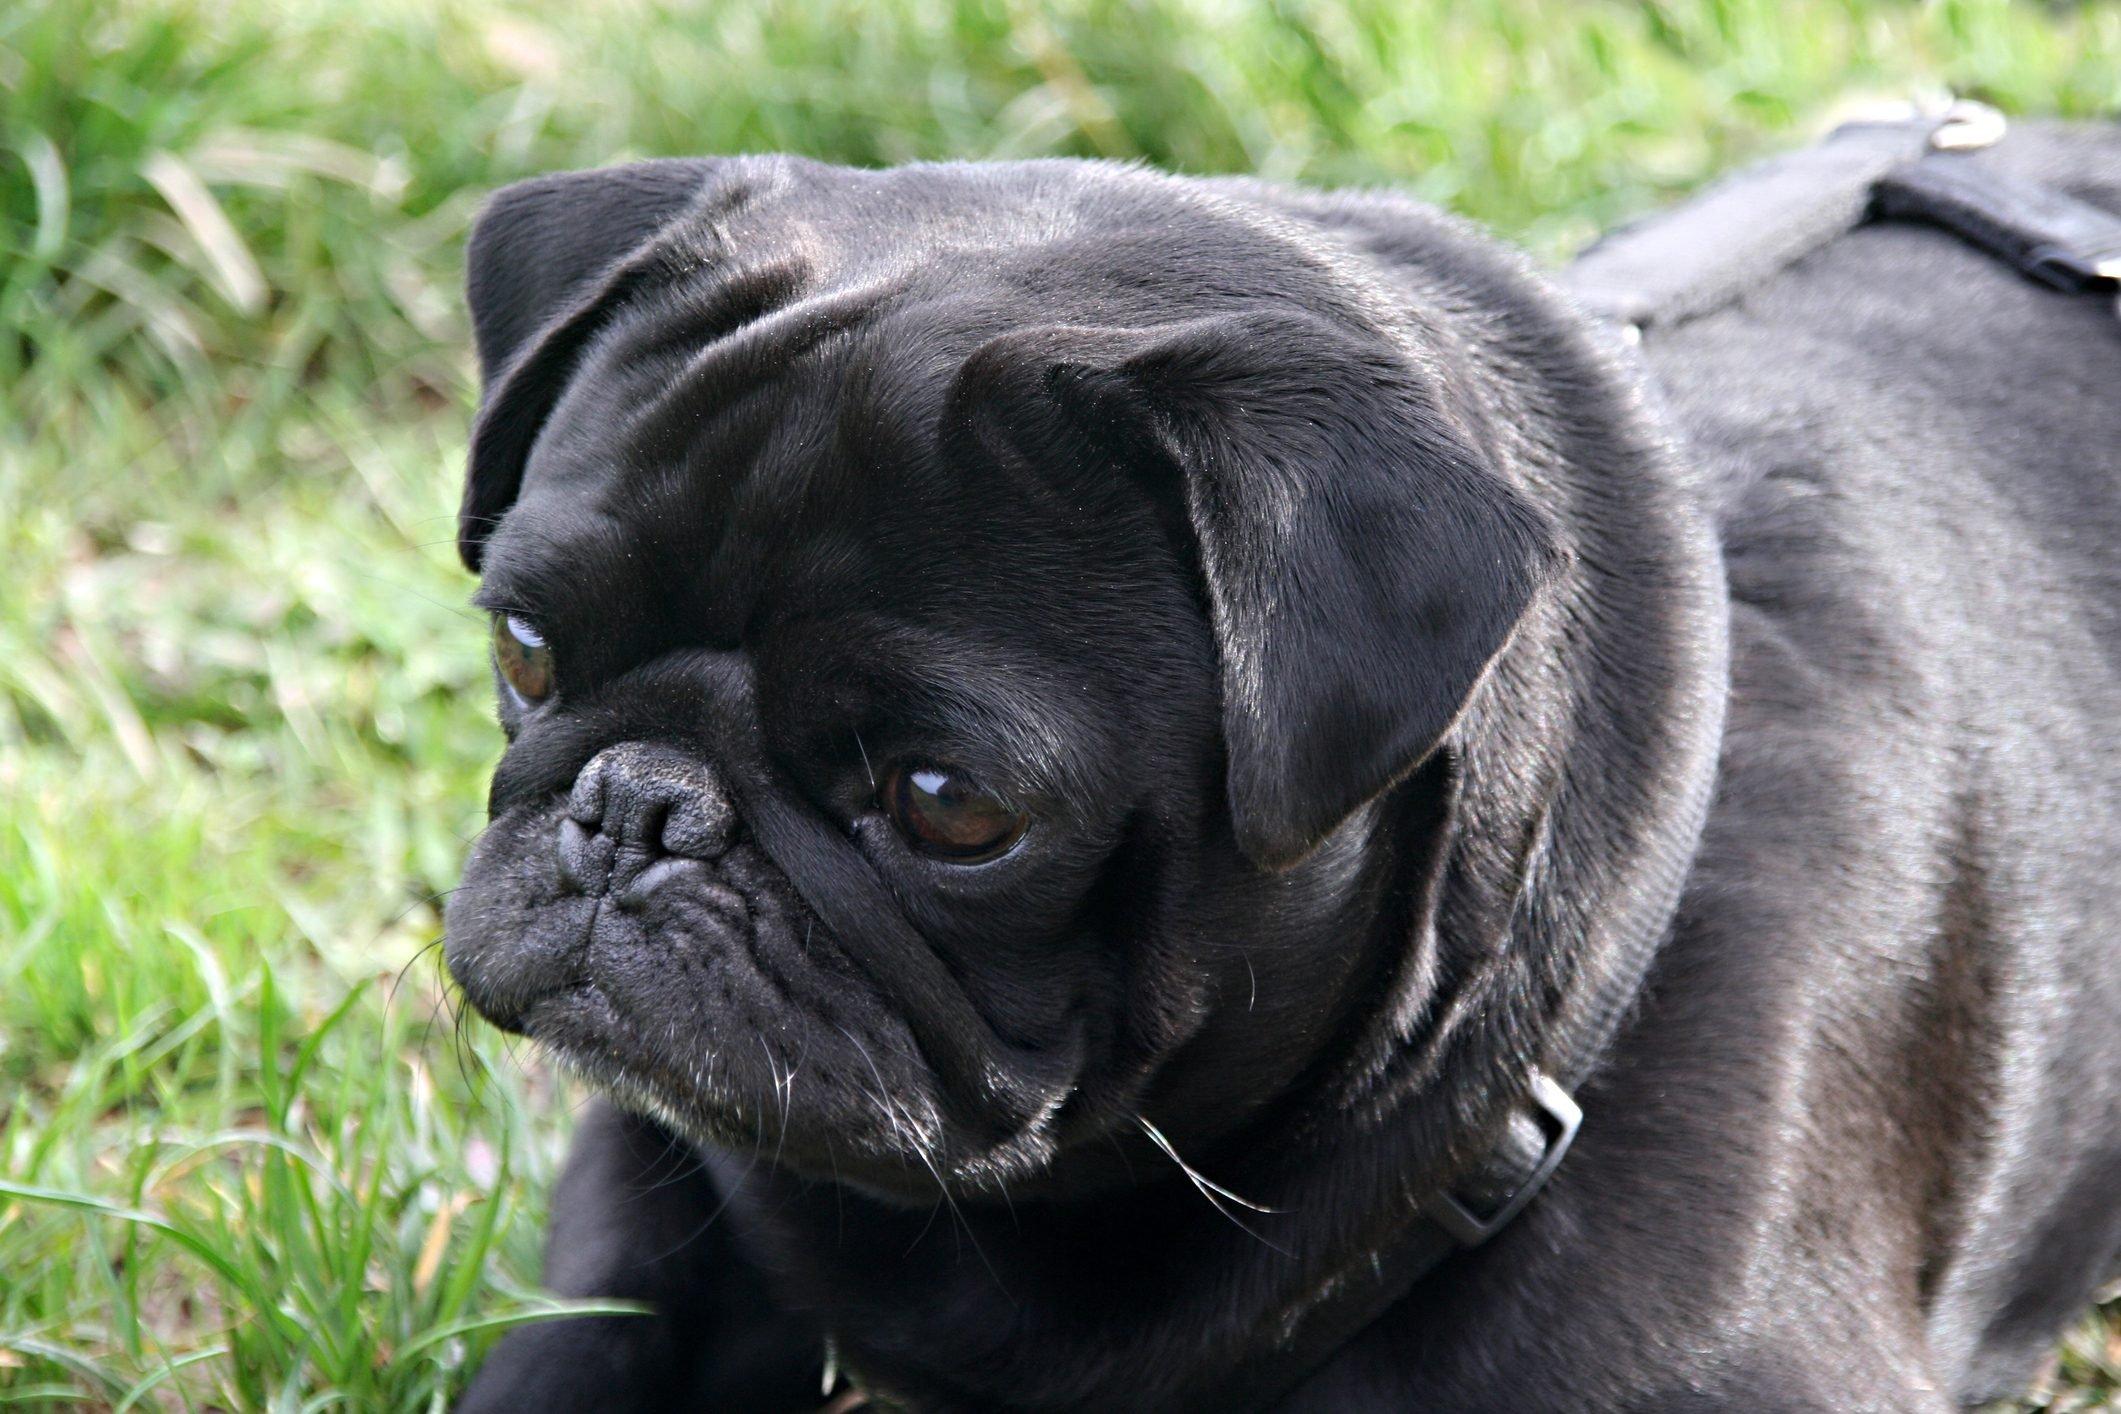 Close-Up Of Black Pug Sitting On Field